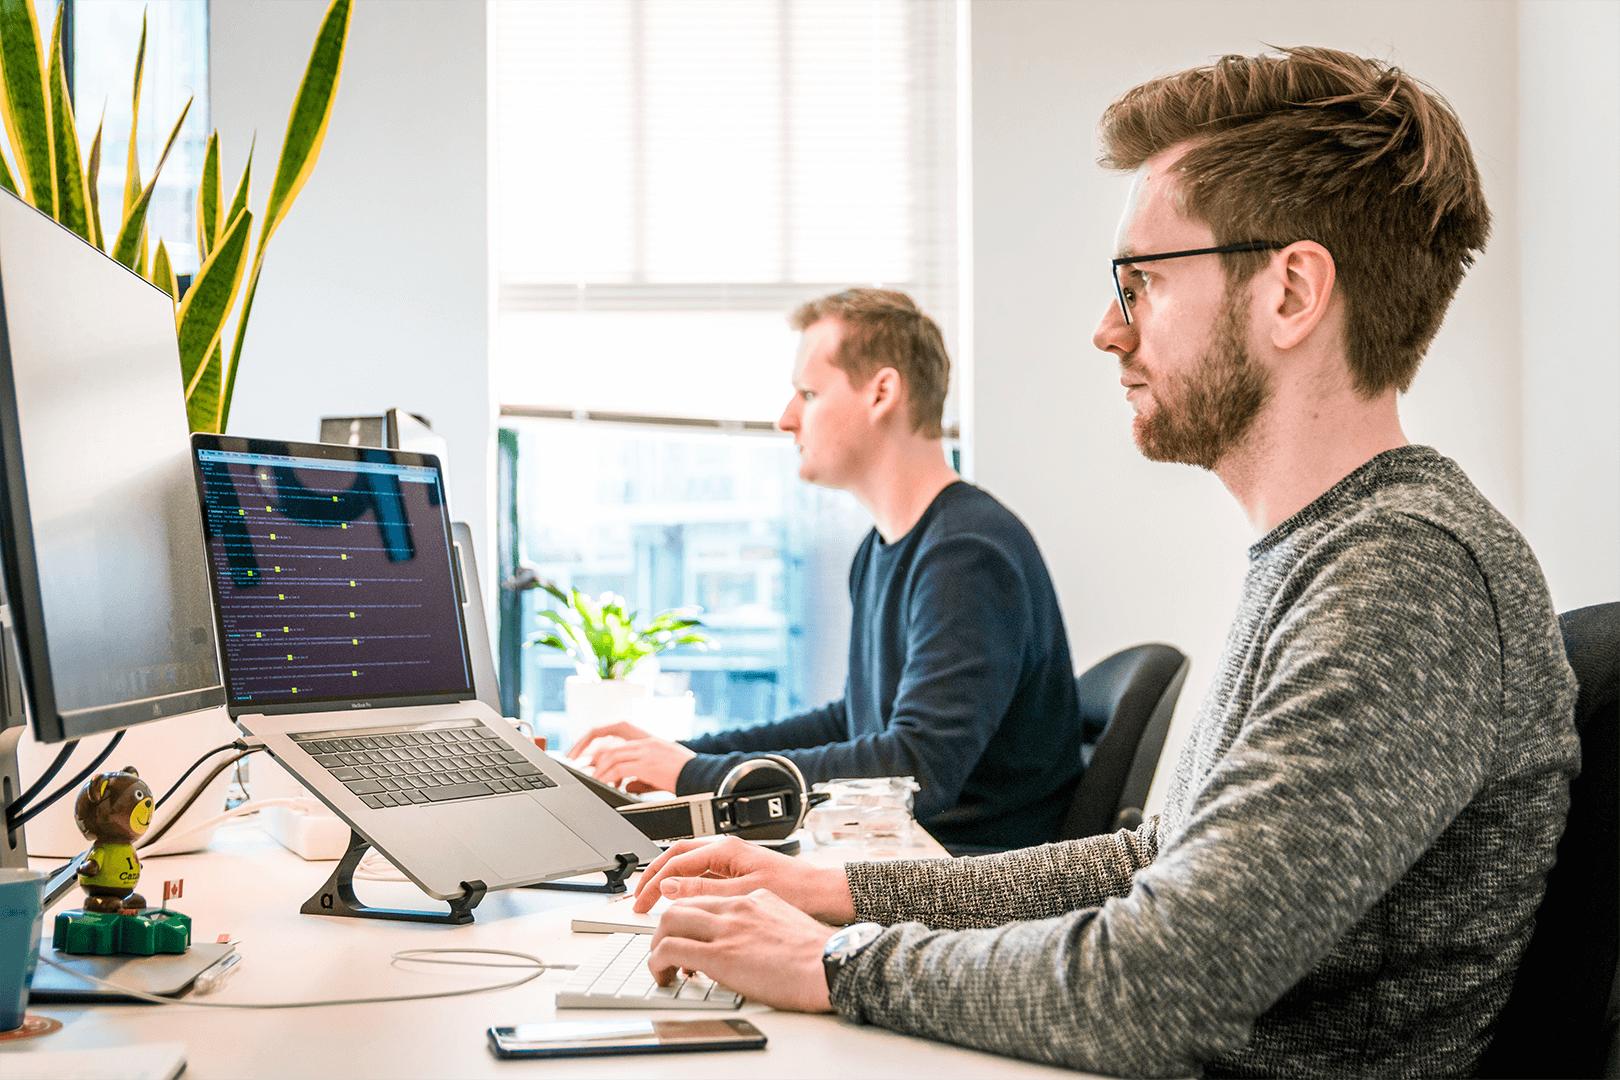 2 men using laptops in office